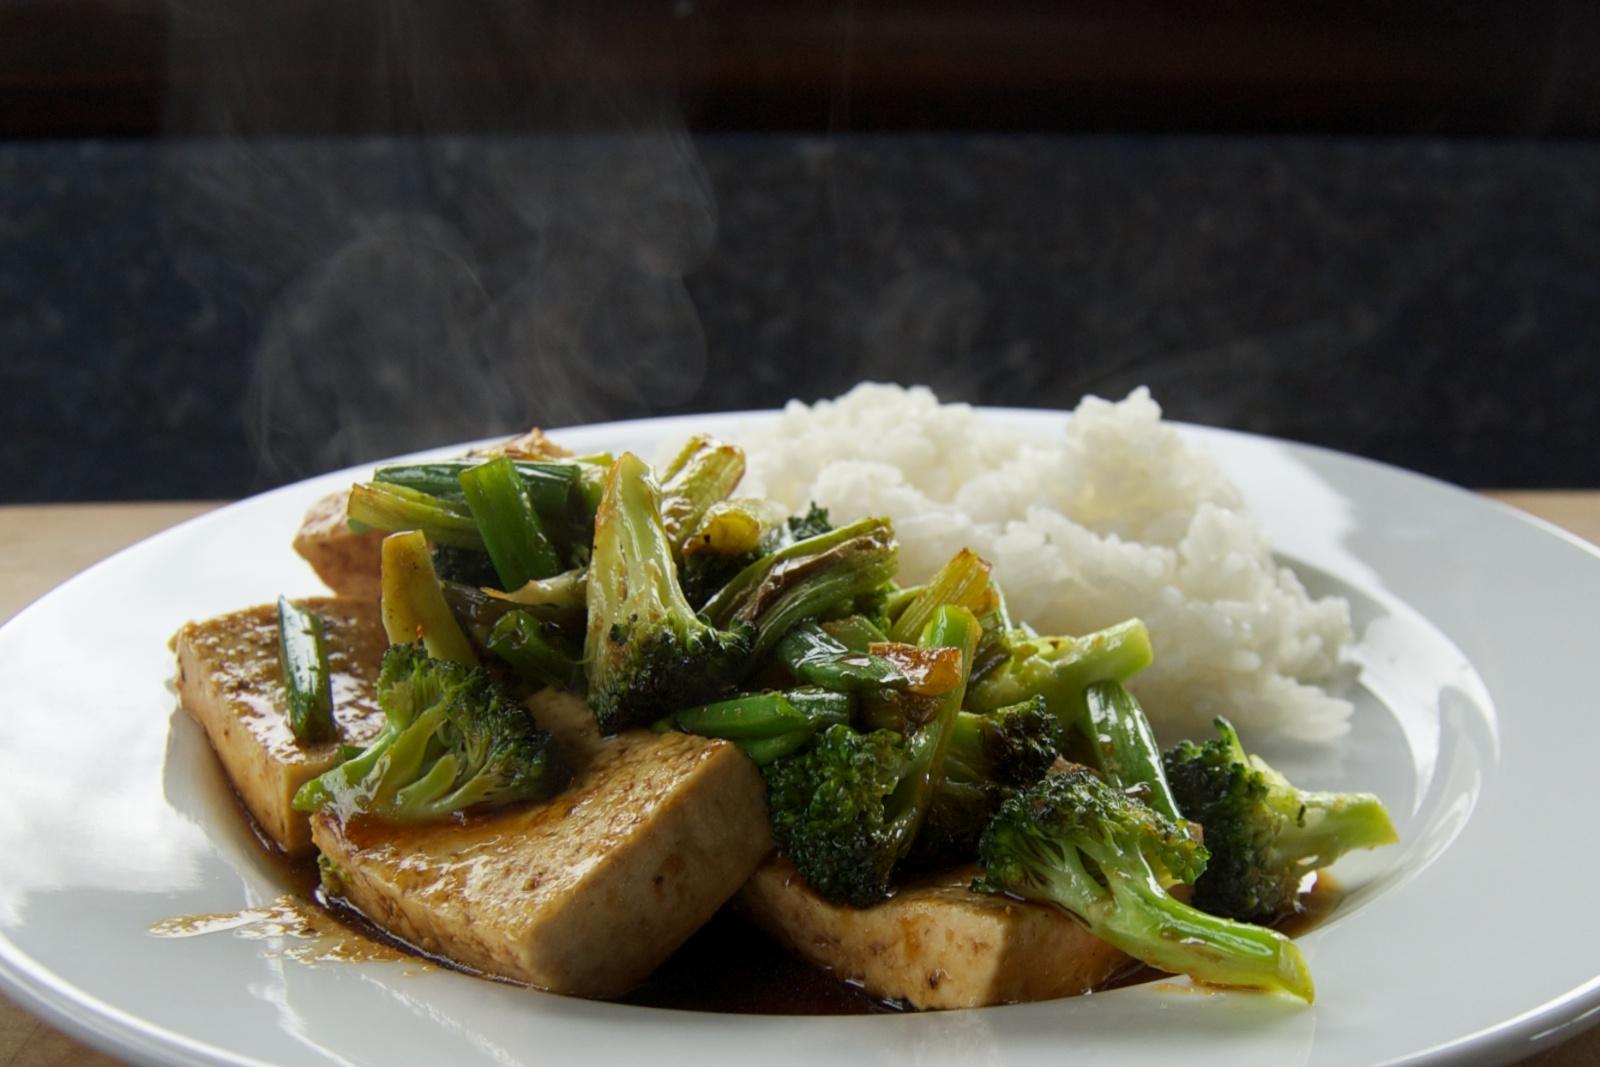 http://blog.rickk.com/food/2013/04/22/ate.2013.04.22.l.jpg